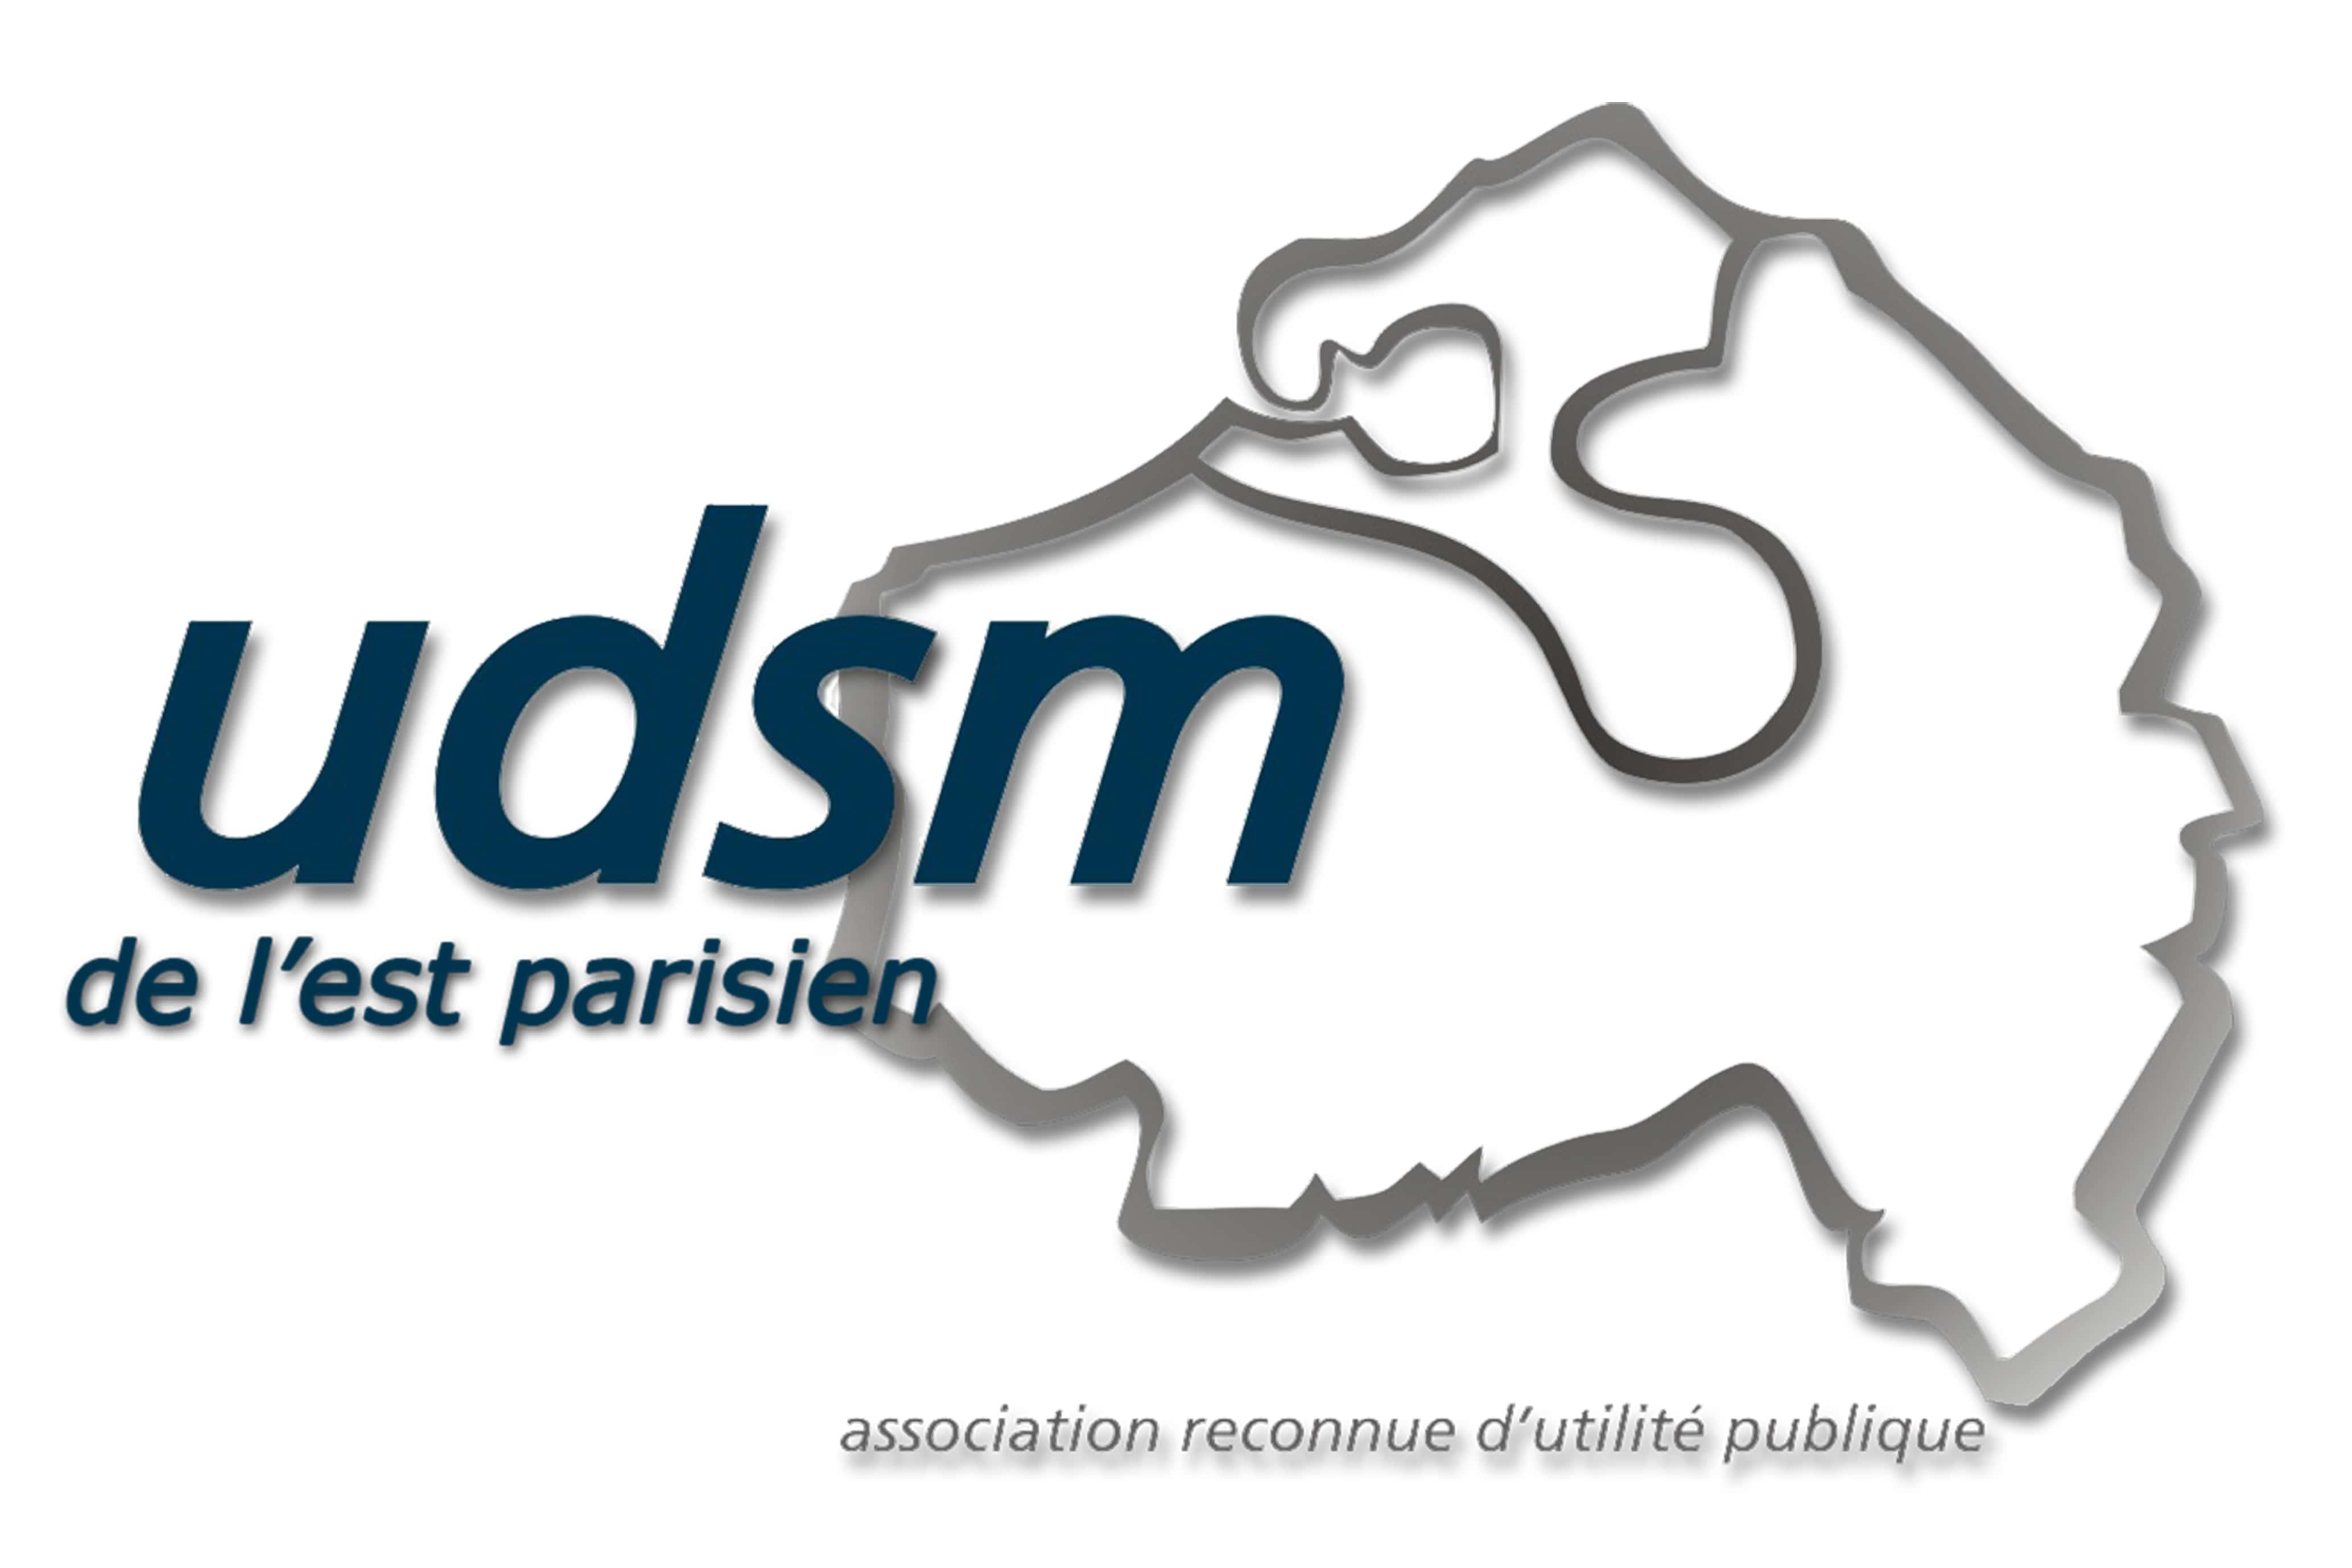 Association UDSM